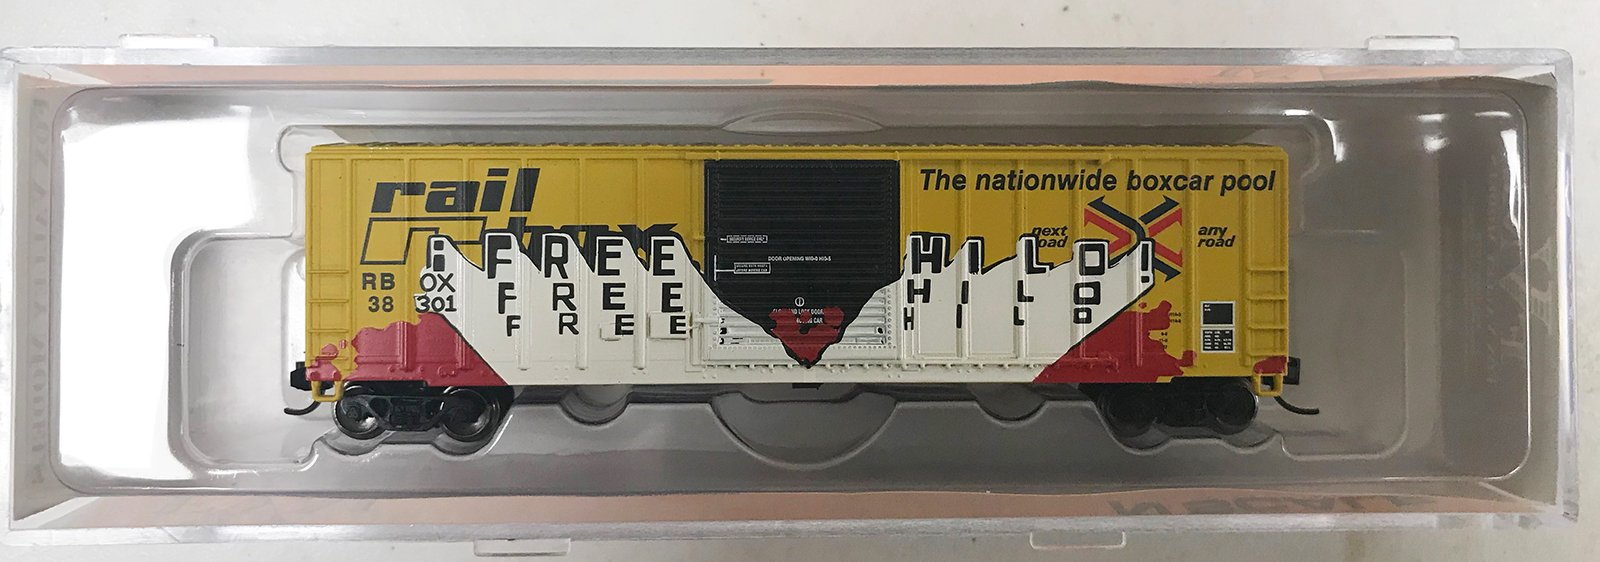 N Scale - Fox Valley - 80328 - Boxcar, 50 Foot, FMC, 5347 - RailBox - 38301